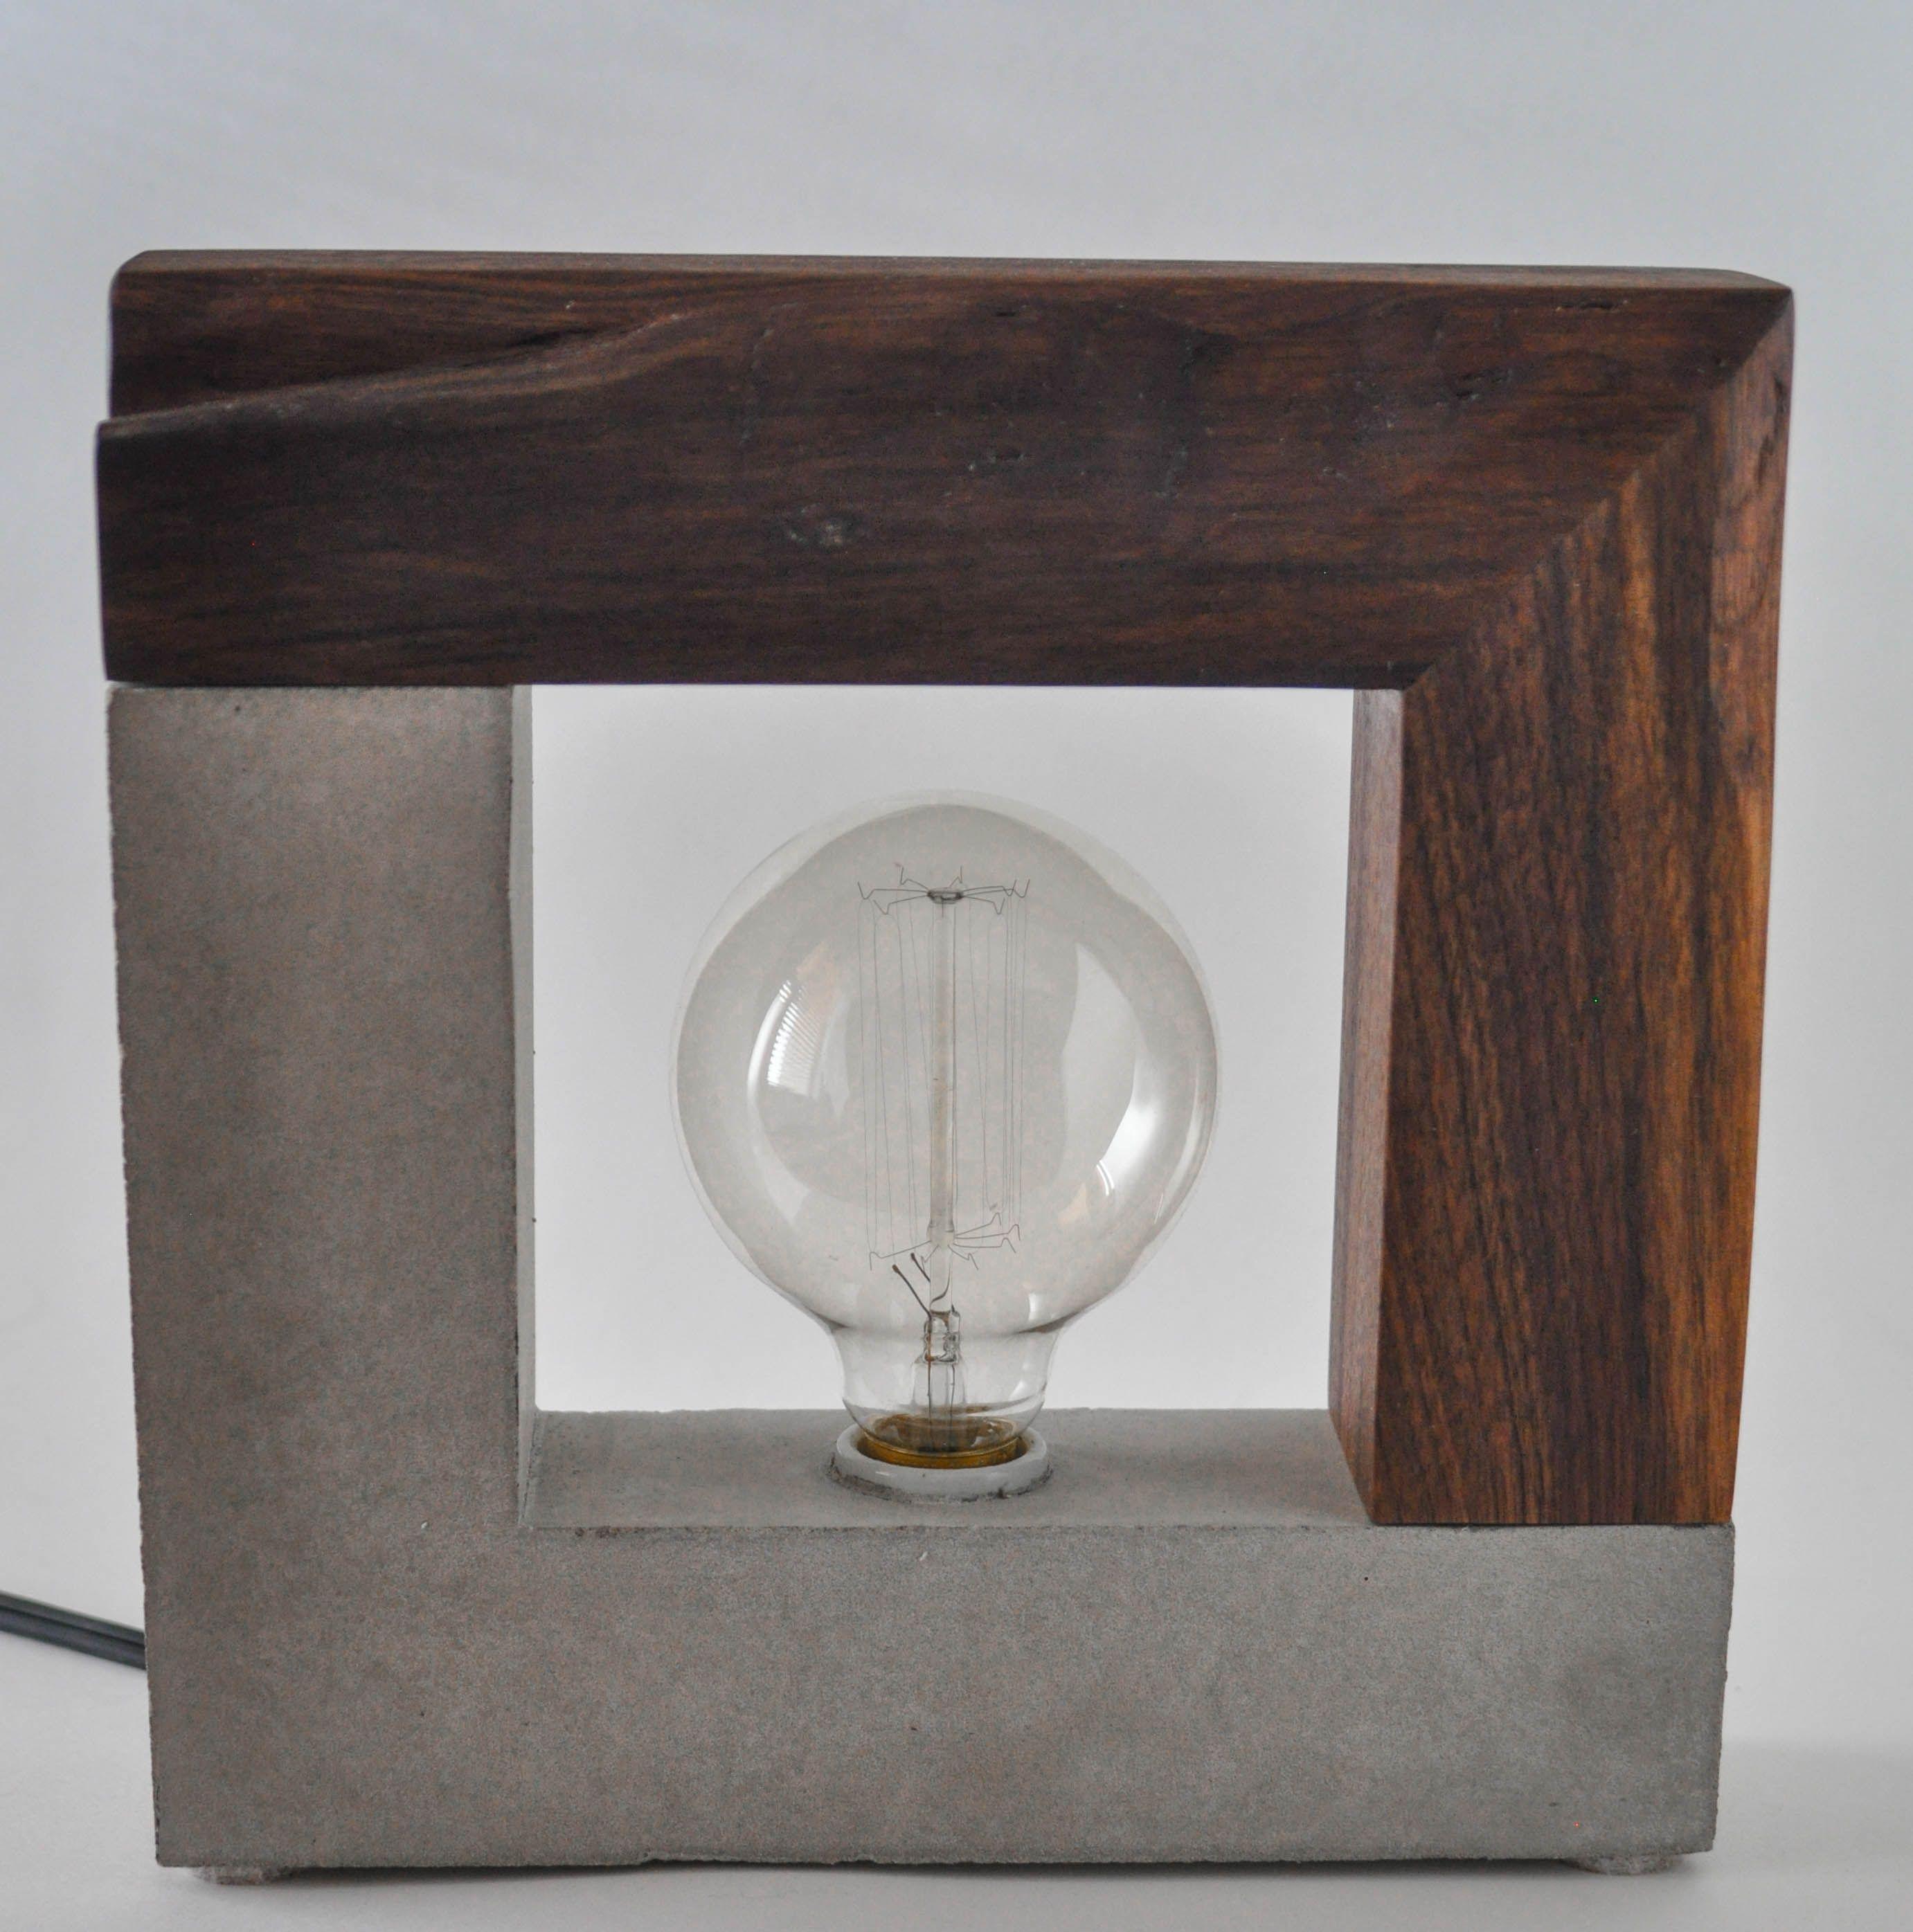 fb1a0d7f4157f777e54158e5b06b2580 Résultat Supérieur 60 Luxe Lampe Decorative Stock 2018 Ldkt